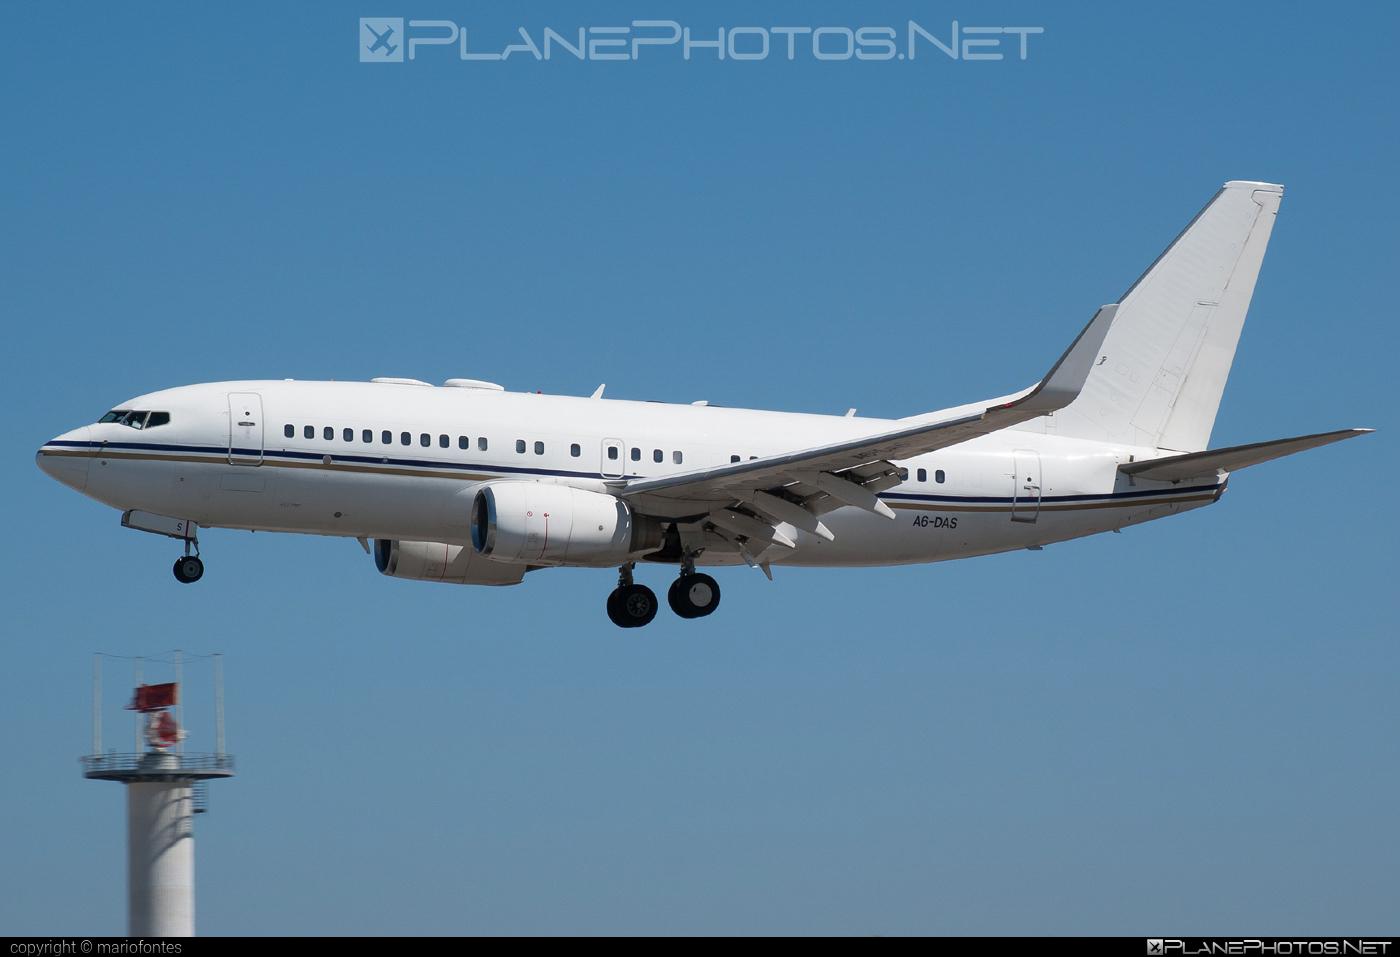 Boeing 737-700 BBJ - A6-DAS operated by Royal Jet #b737 #b737bbj #bbj #boeing #boeing737 #boeingbusinessjet #royaljet